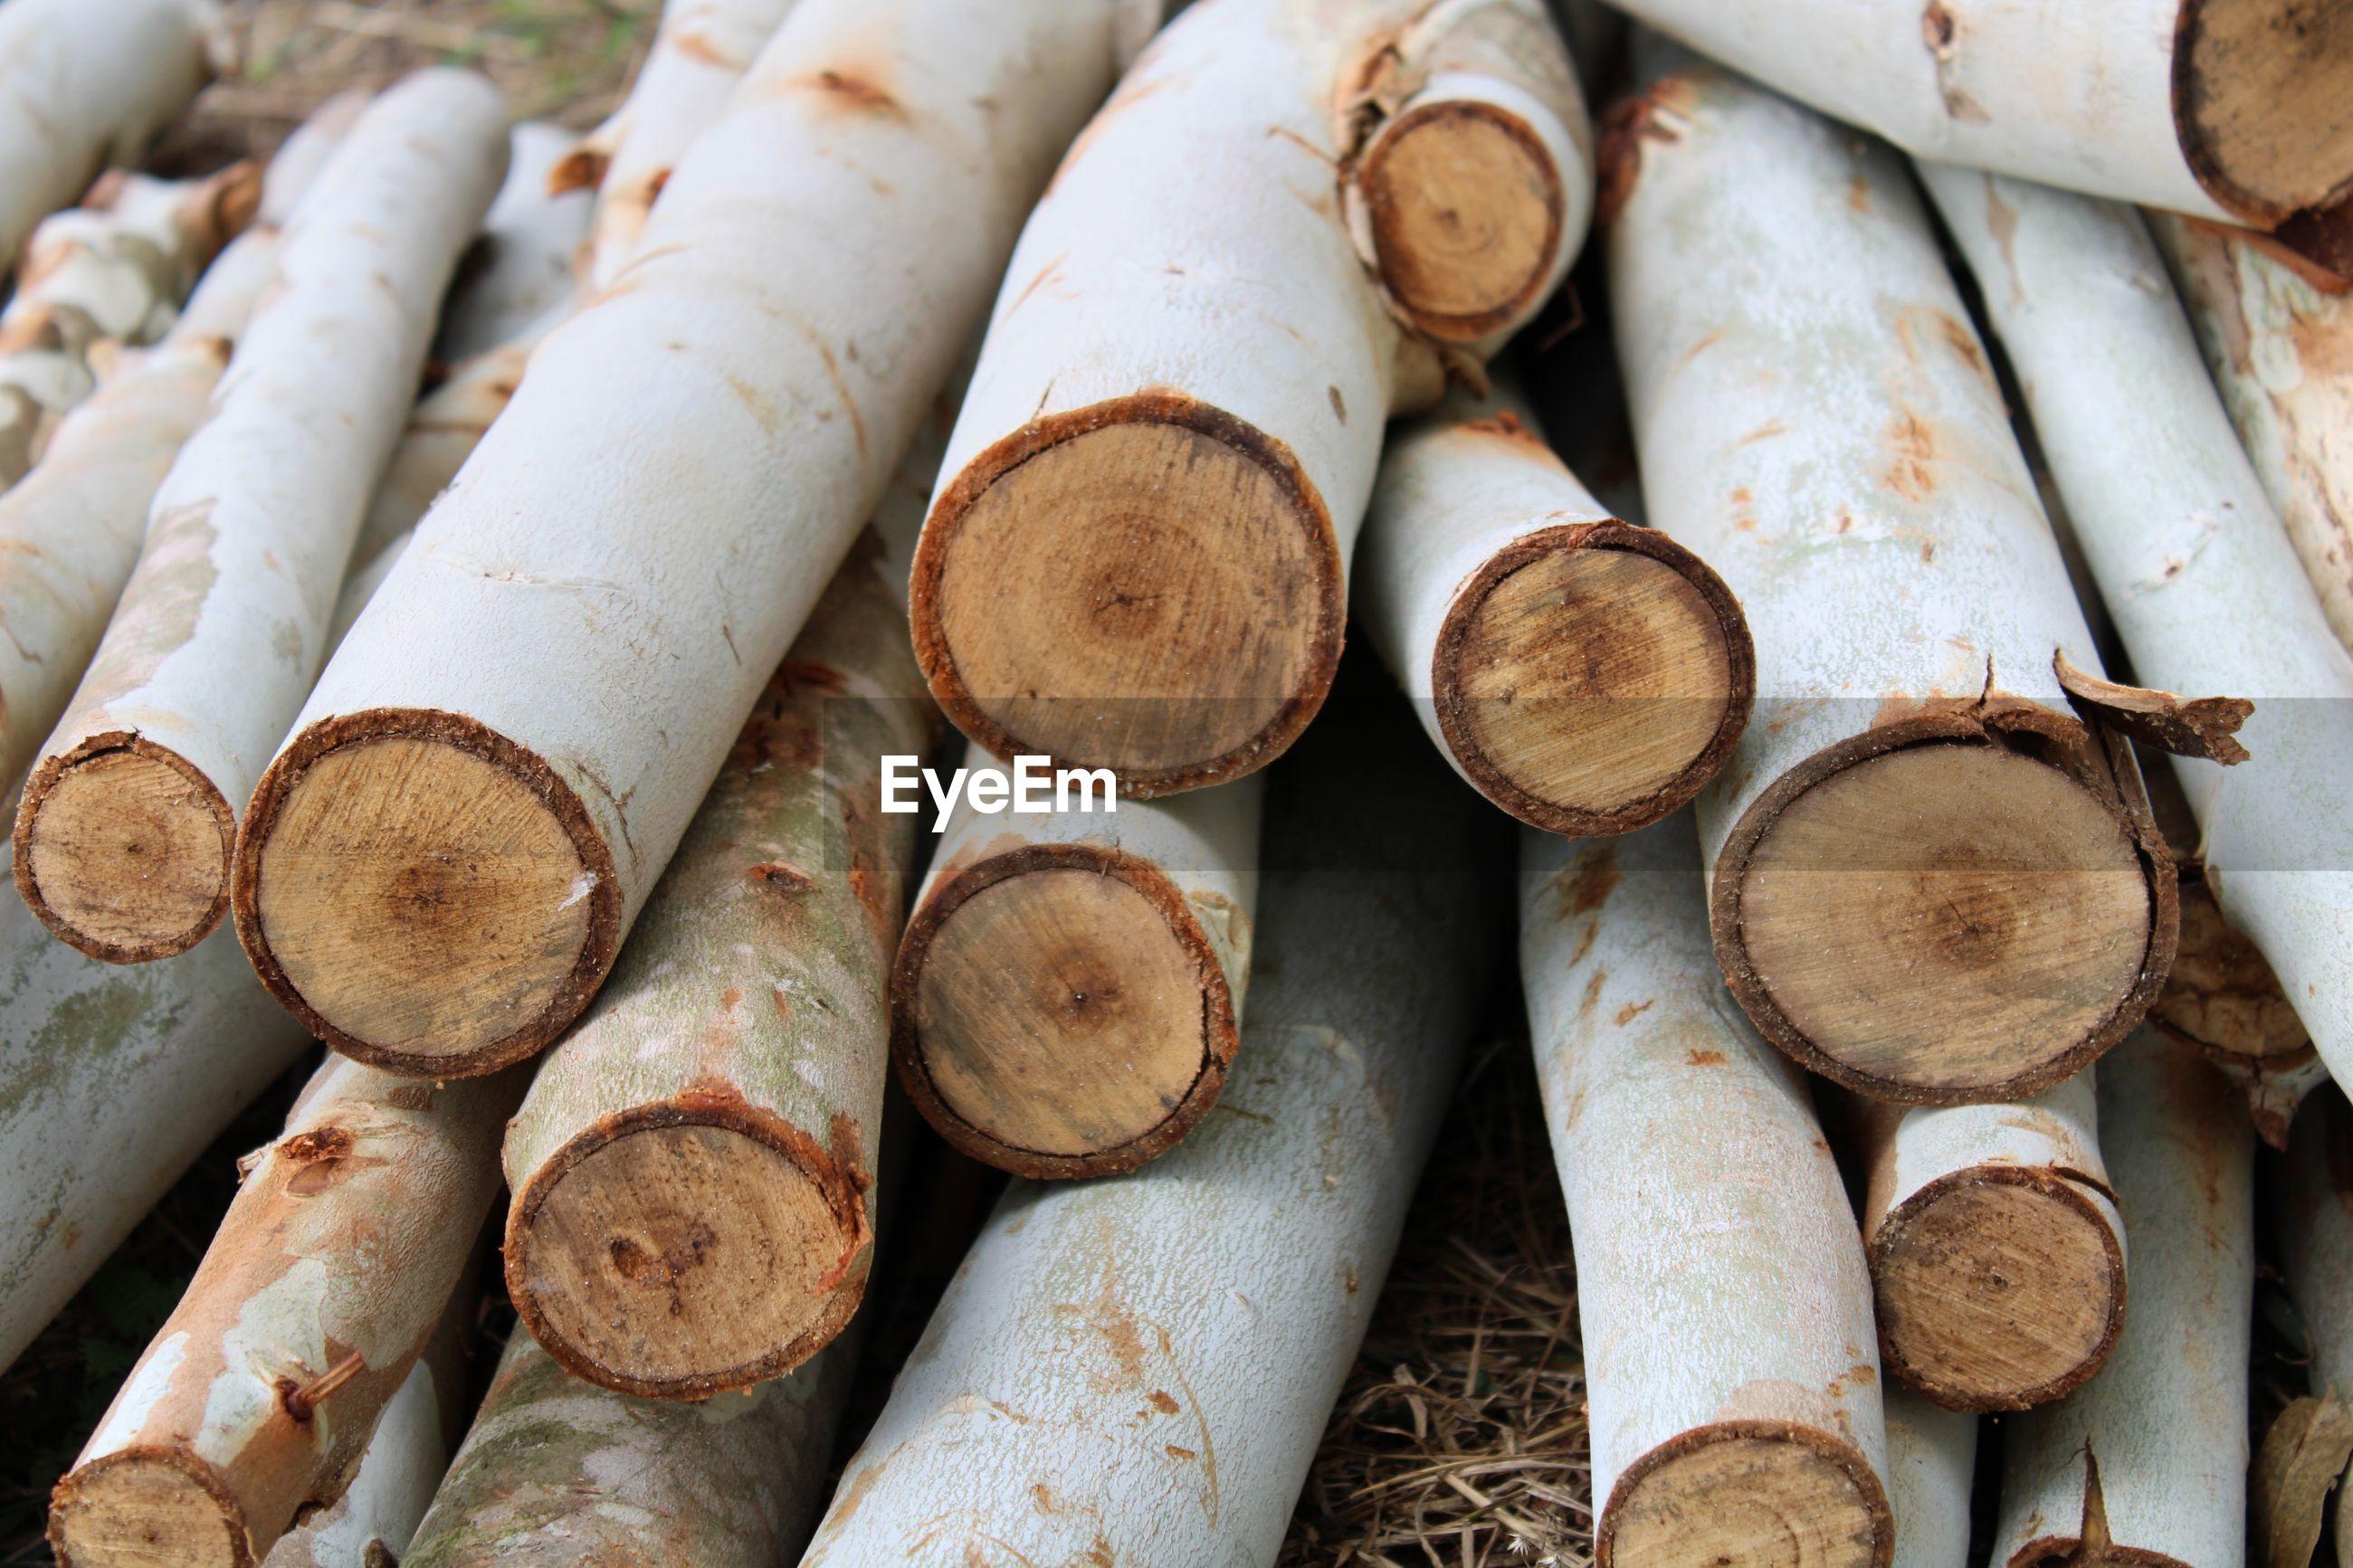 Firewoods pile